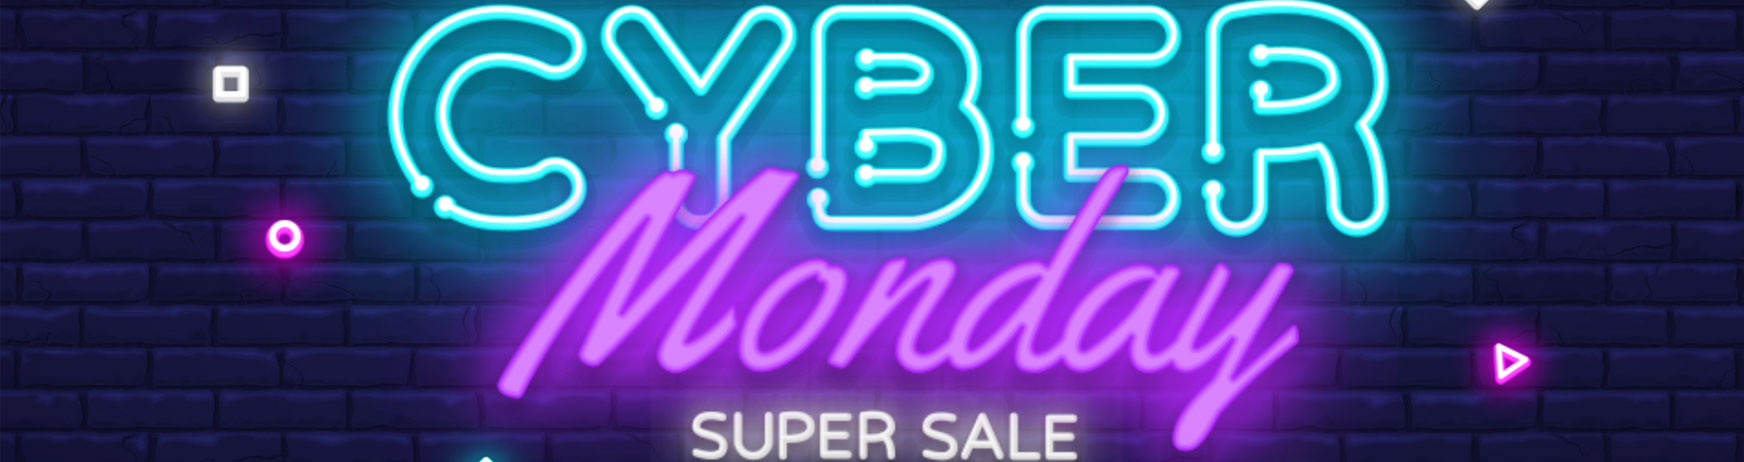 Cyber Monday -50% SALE